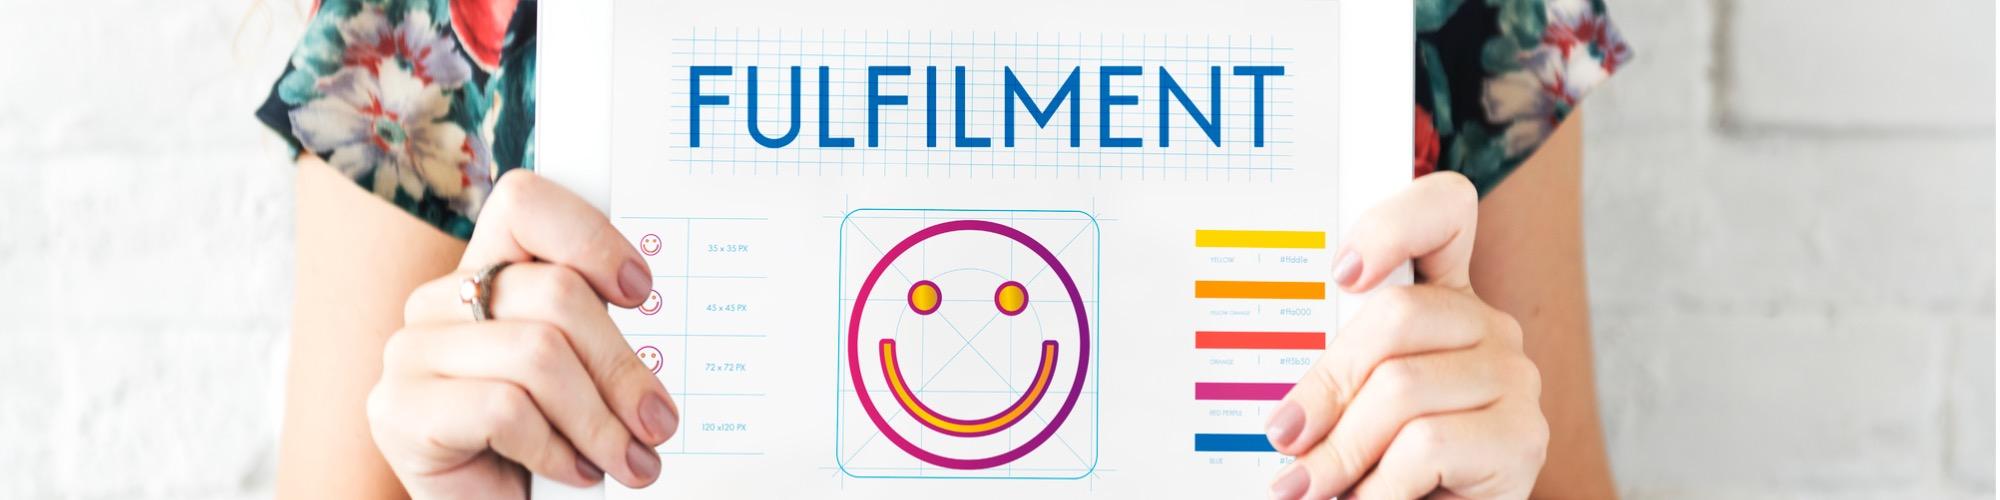 FULFILMENT